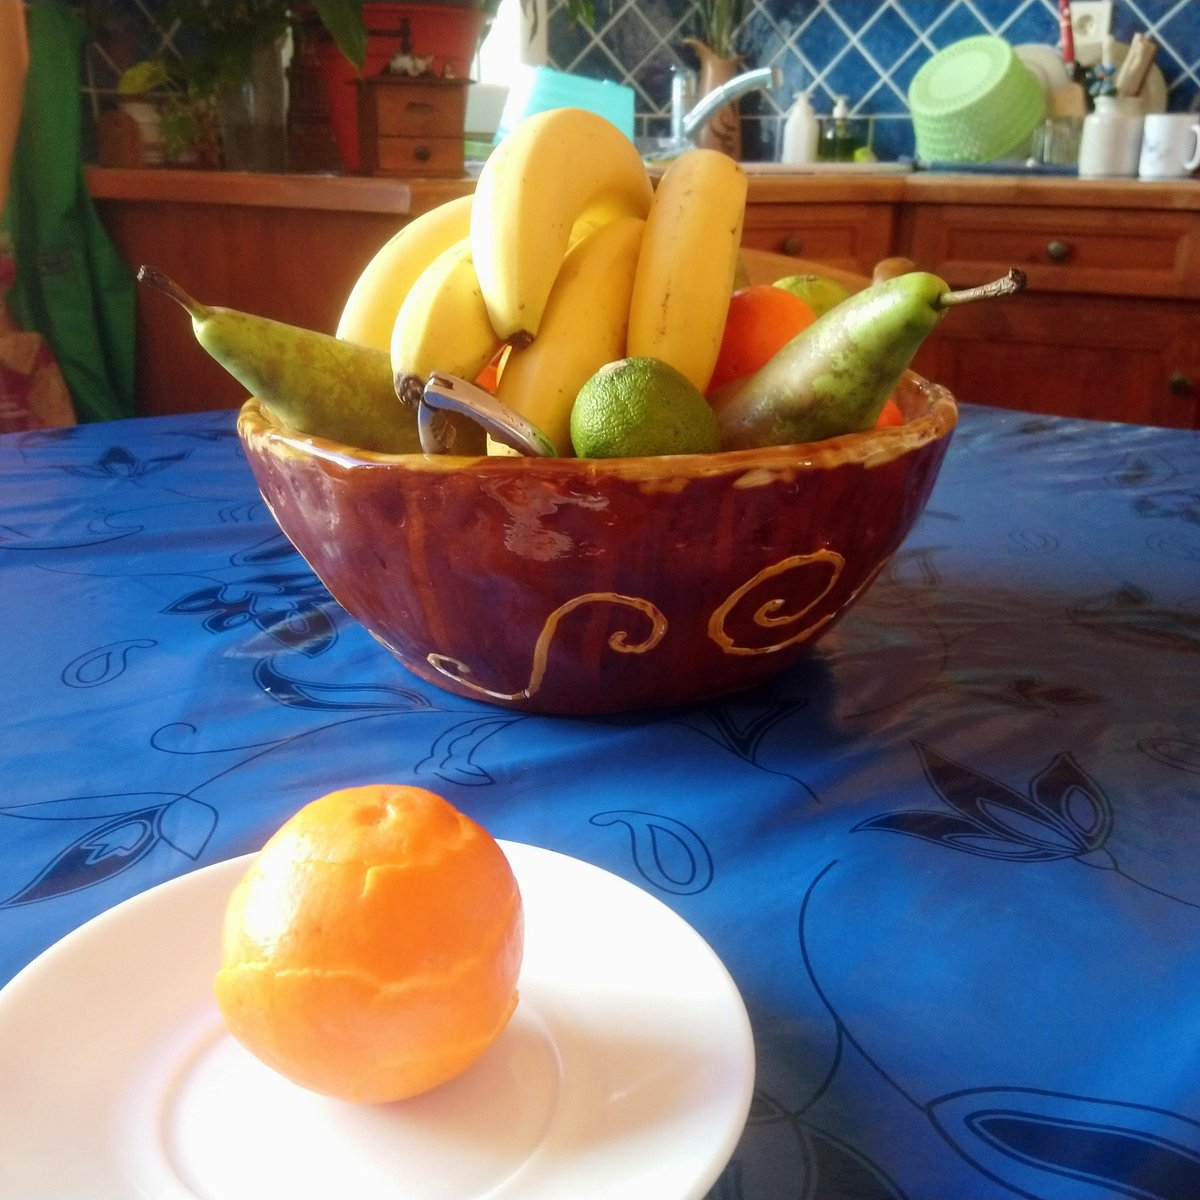 "Khris-Léo, ""Orange"" - 2019, ReConstruction. #KhrisLeo #KhrisLeoArt #ReConstruction #KhrisLeoReConstruction #ArtContemporain #ArtsPlastiques #ArtConceptuel #Art"